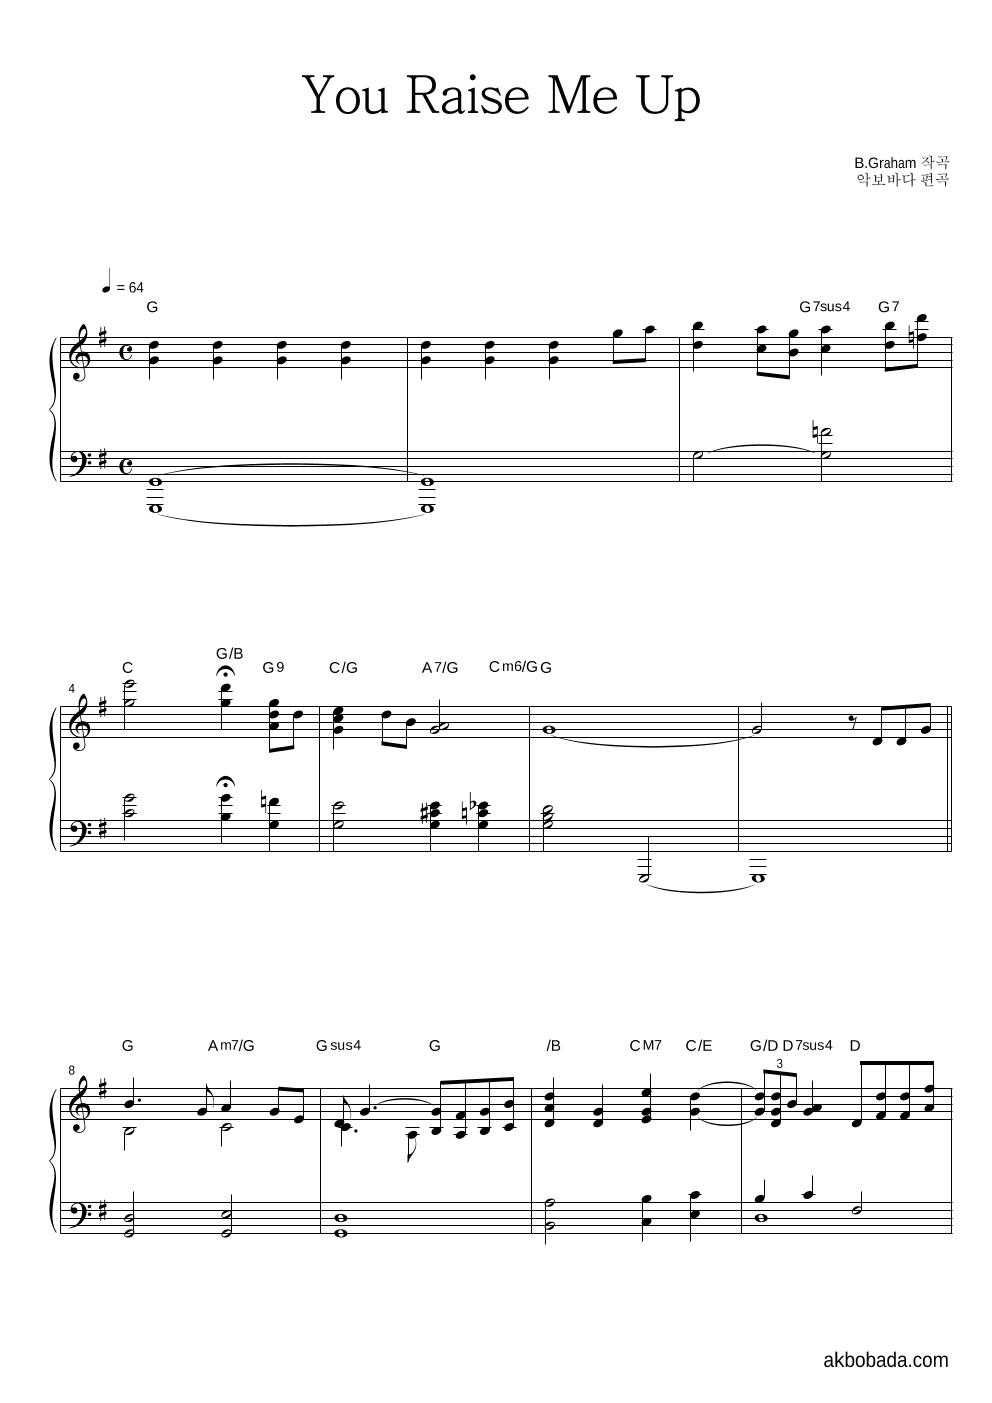 Westlife - You Raise Me Up 피아노 마스터 악보